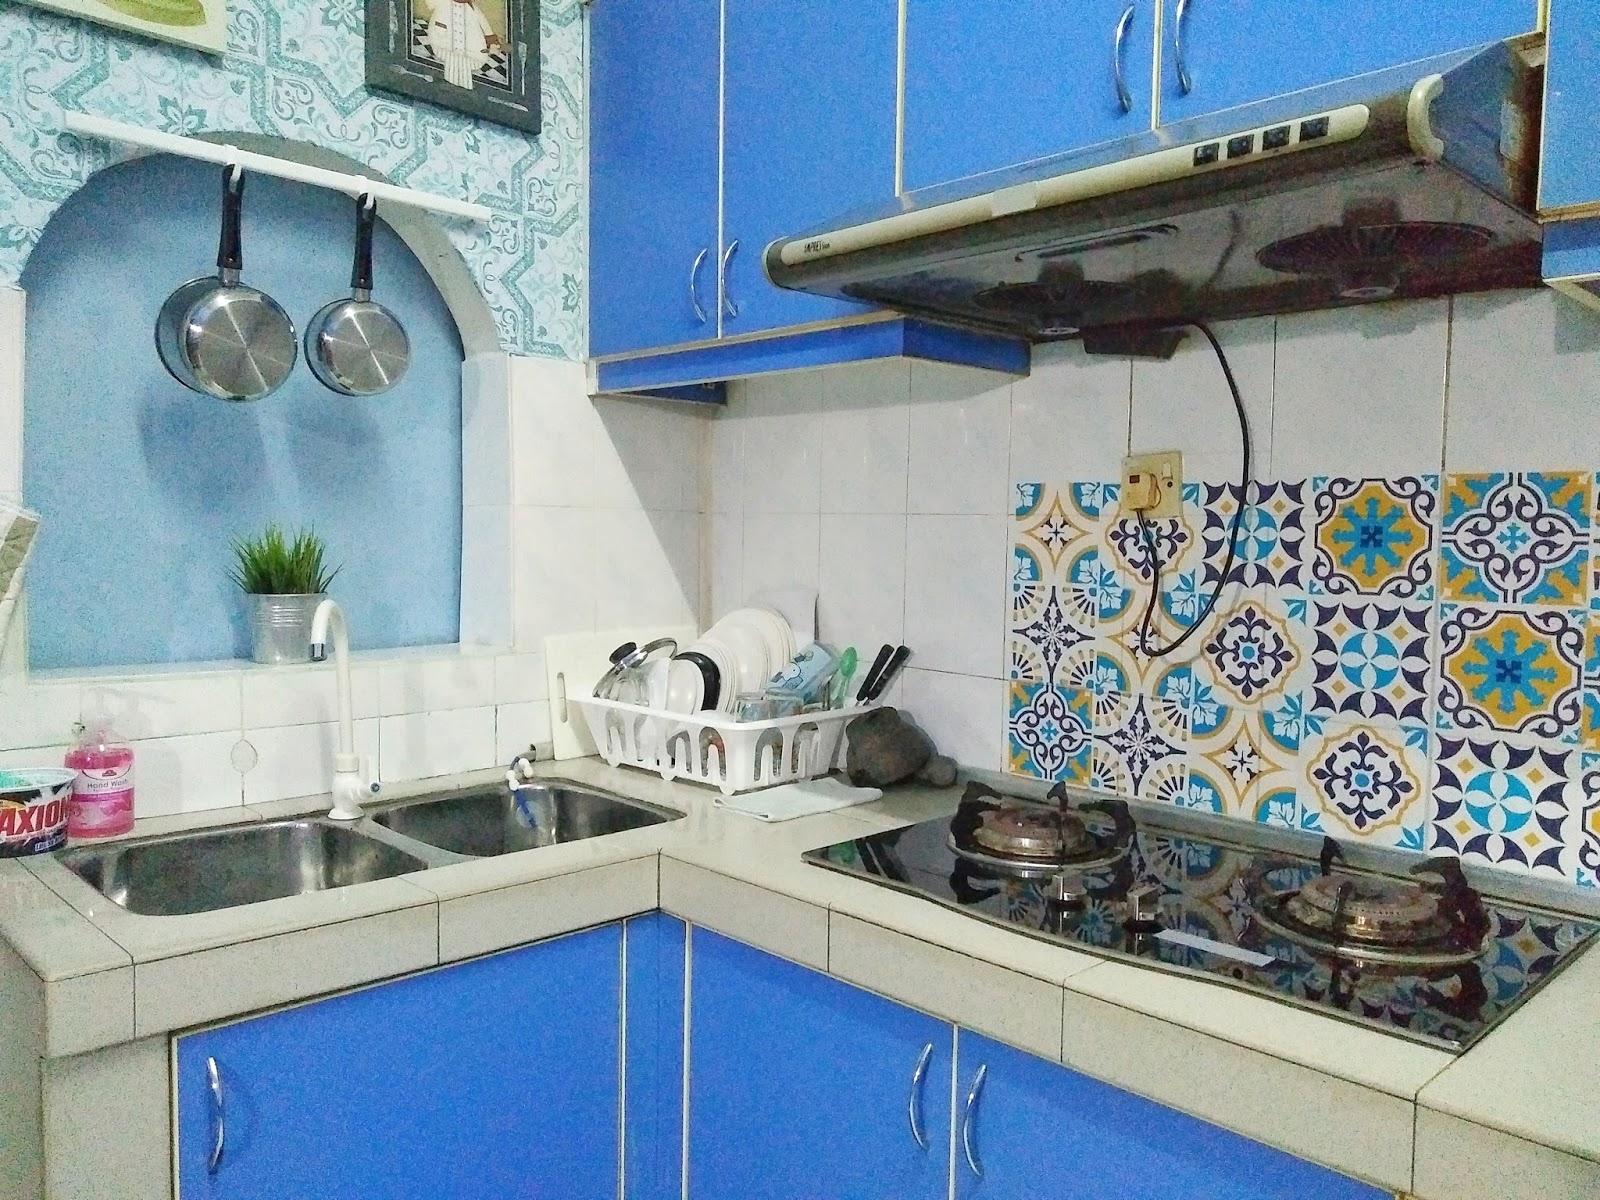 Deko Rumah Bersama Kaison Simple Deko Dapur 1600x1200 Wallpaper Teahub Io